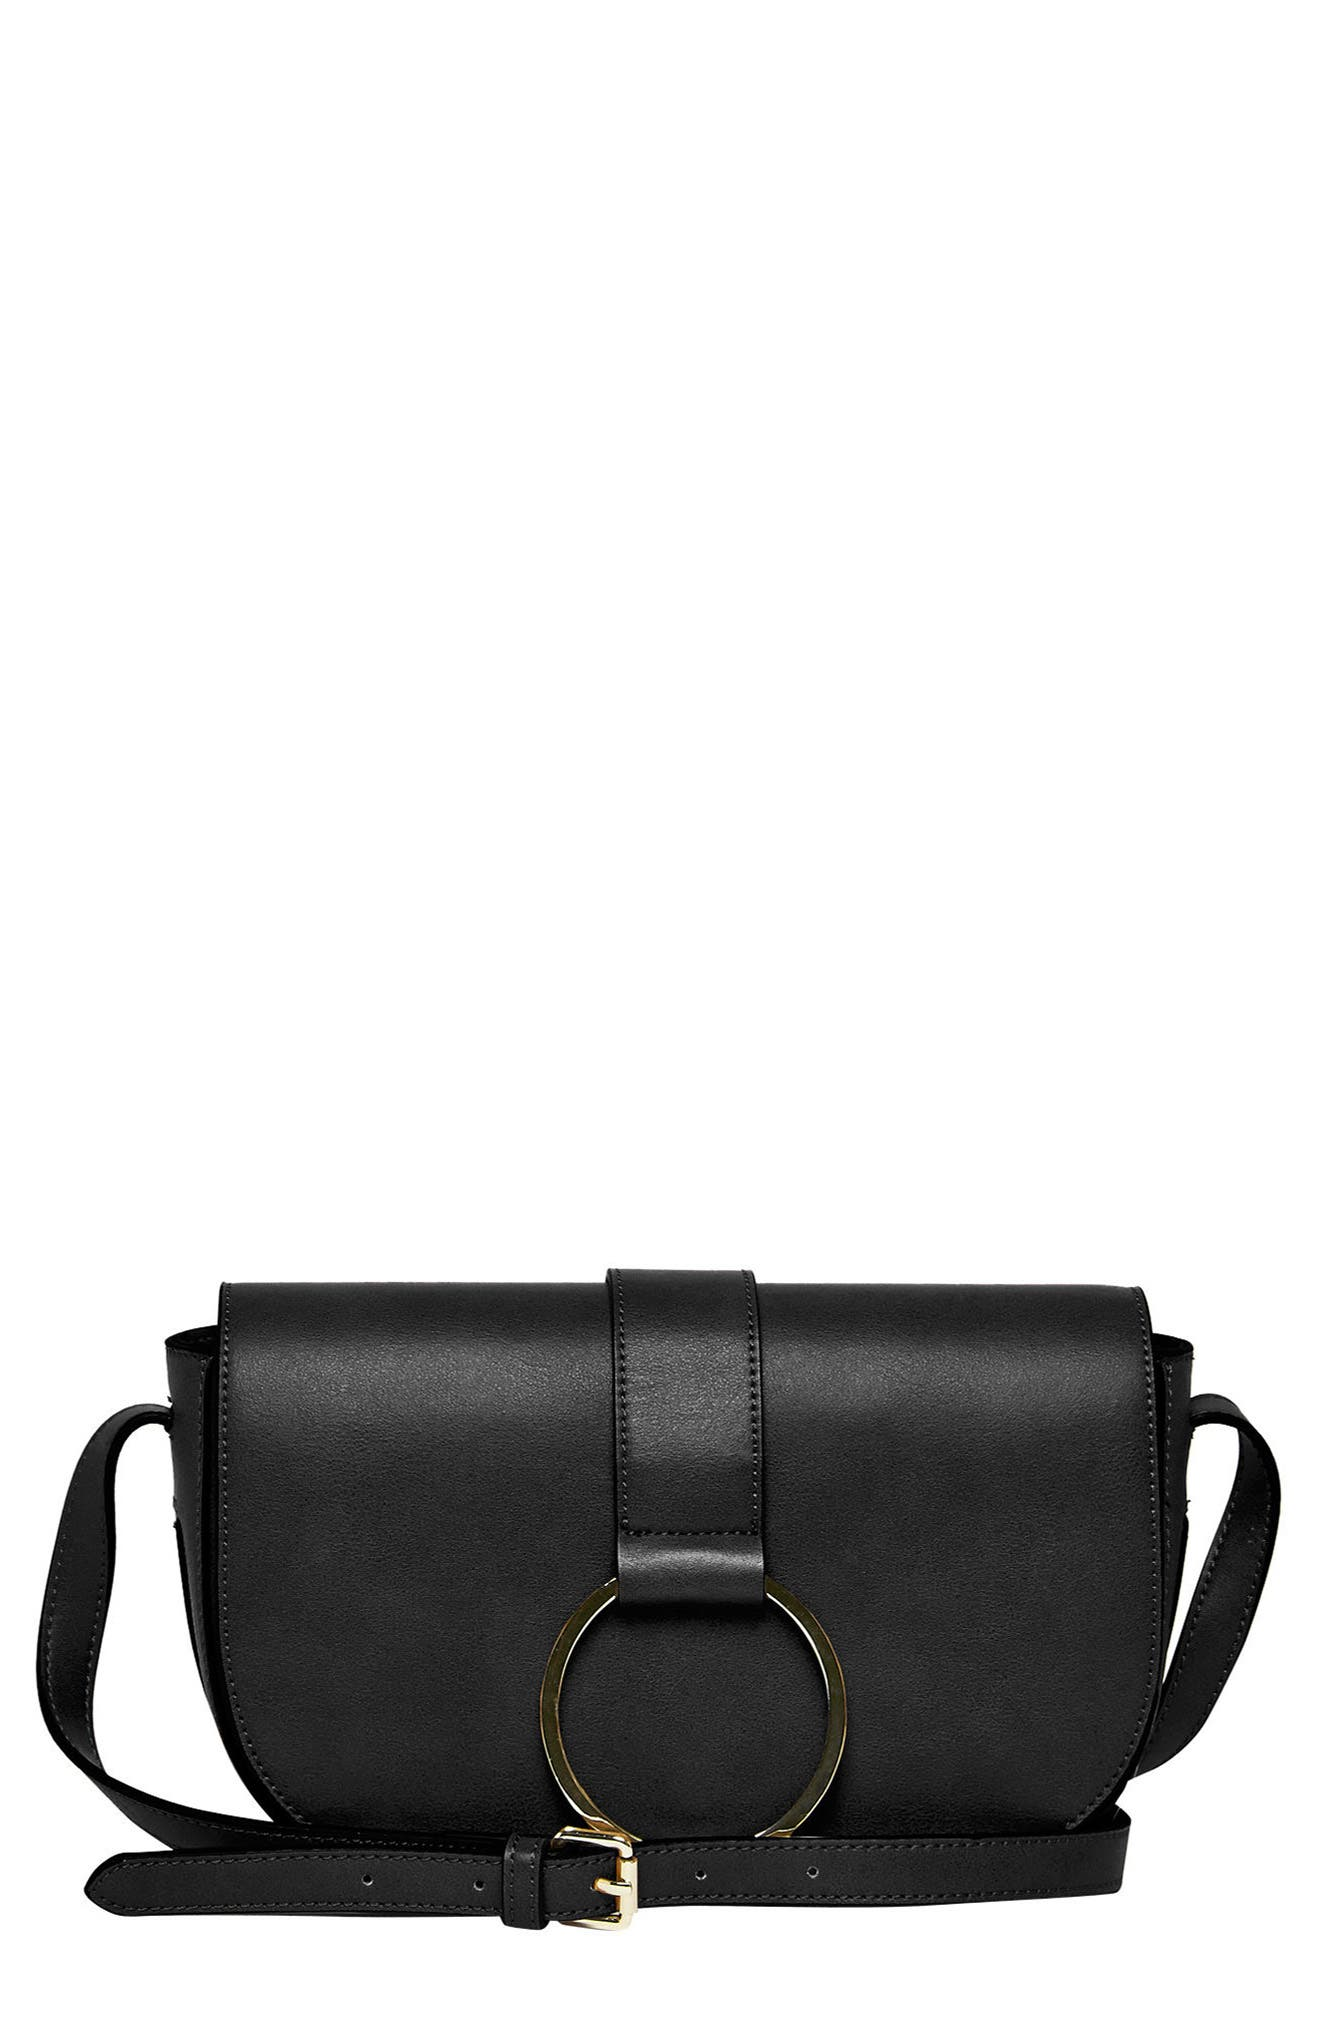 Lola Vegan Leather Crossbody Saddle Bag,                             Main thumbnail 1, color,                             001